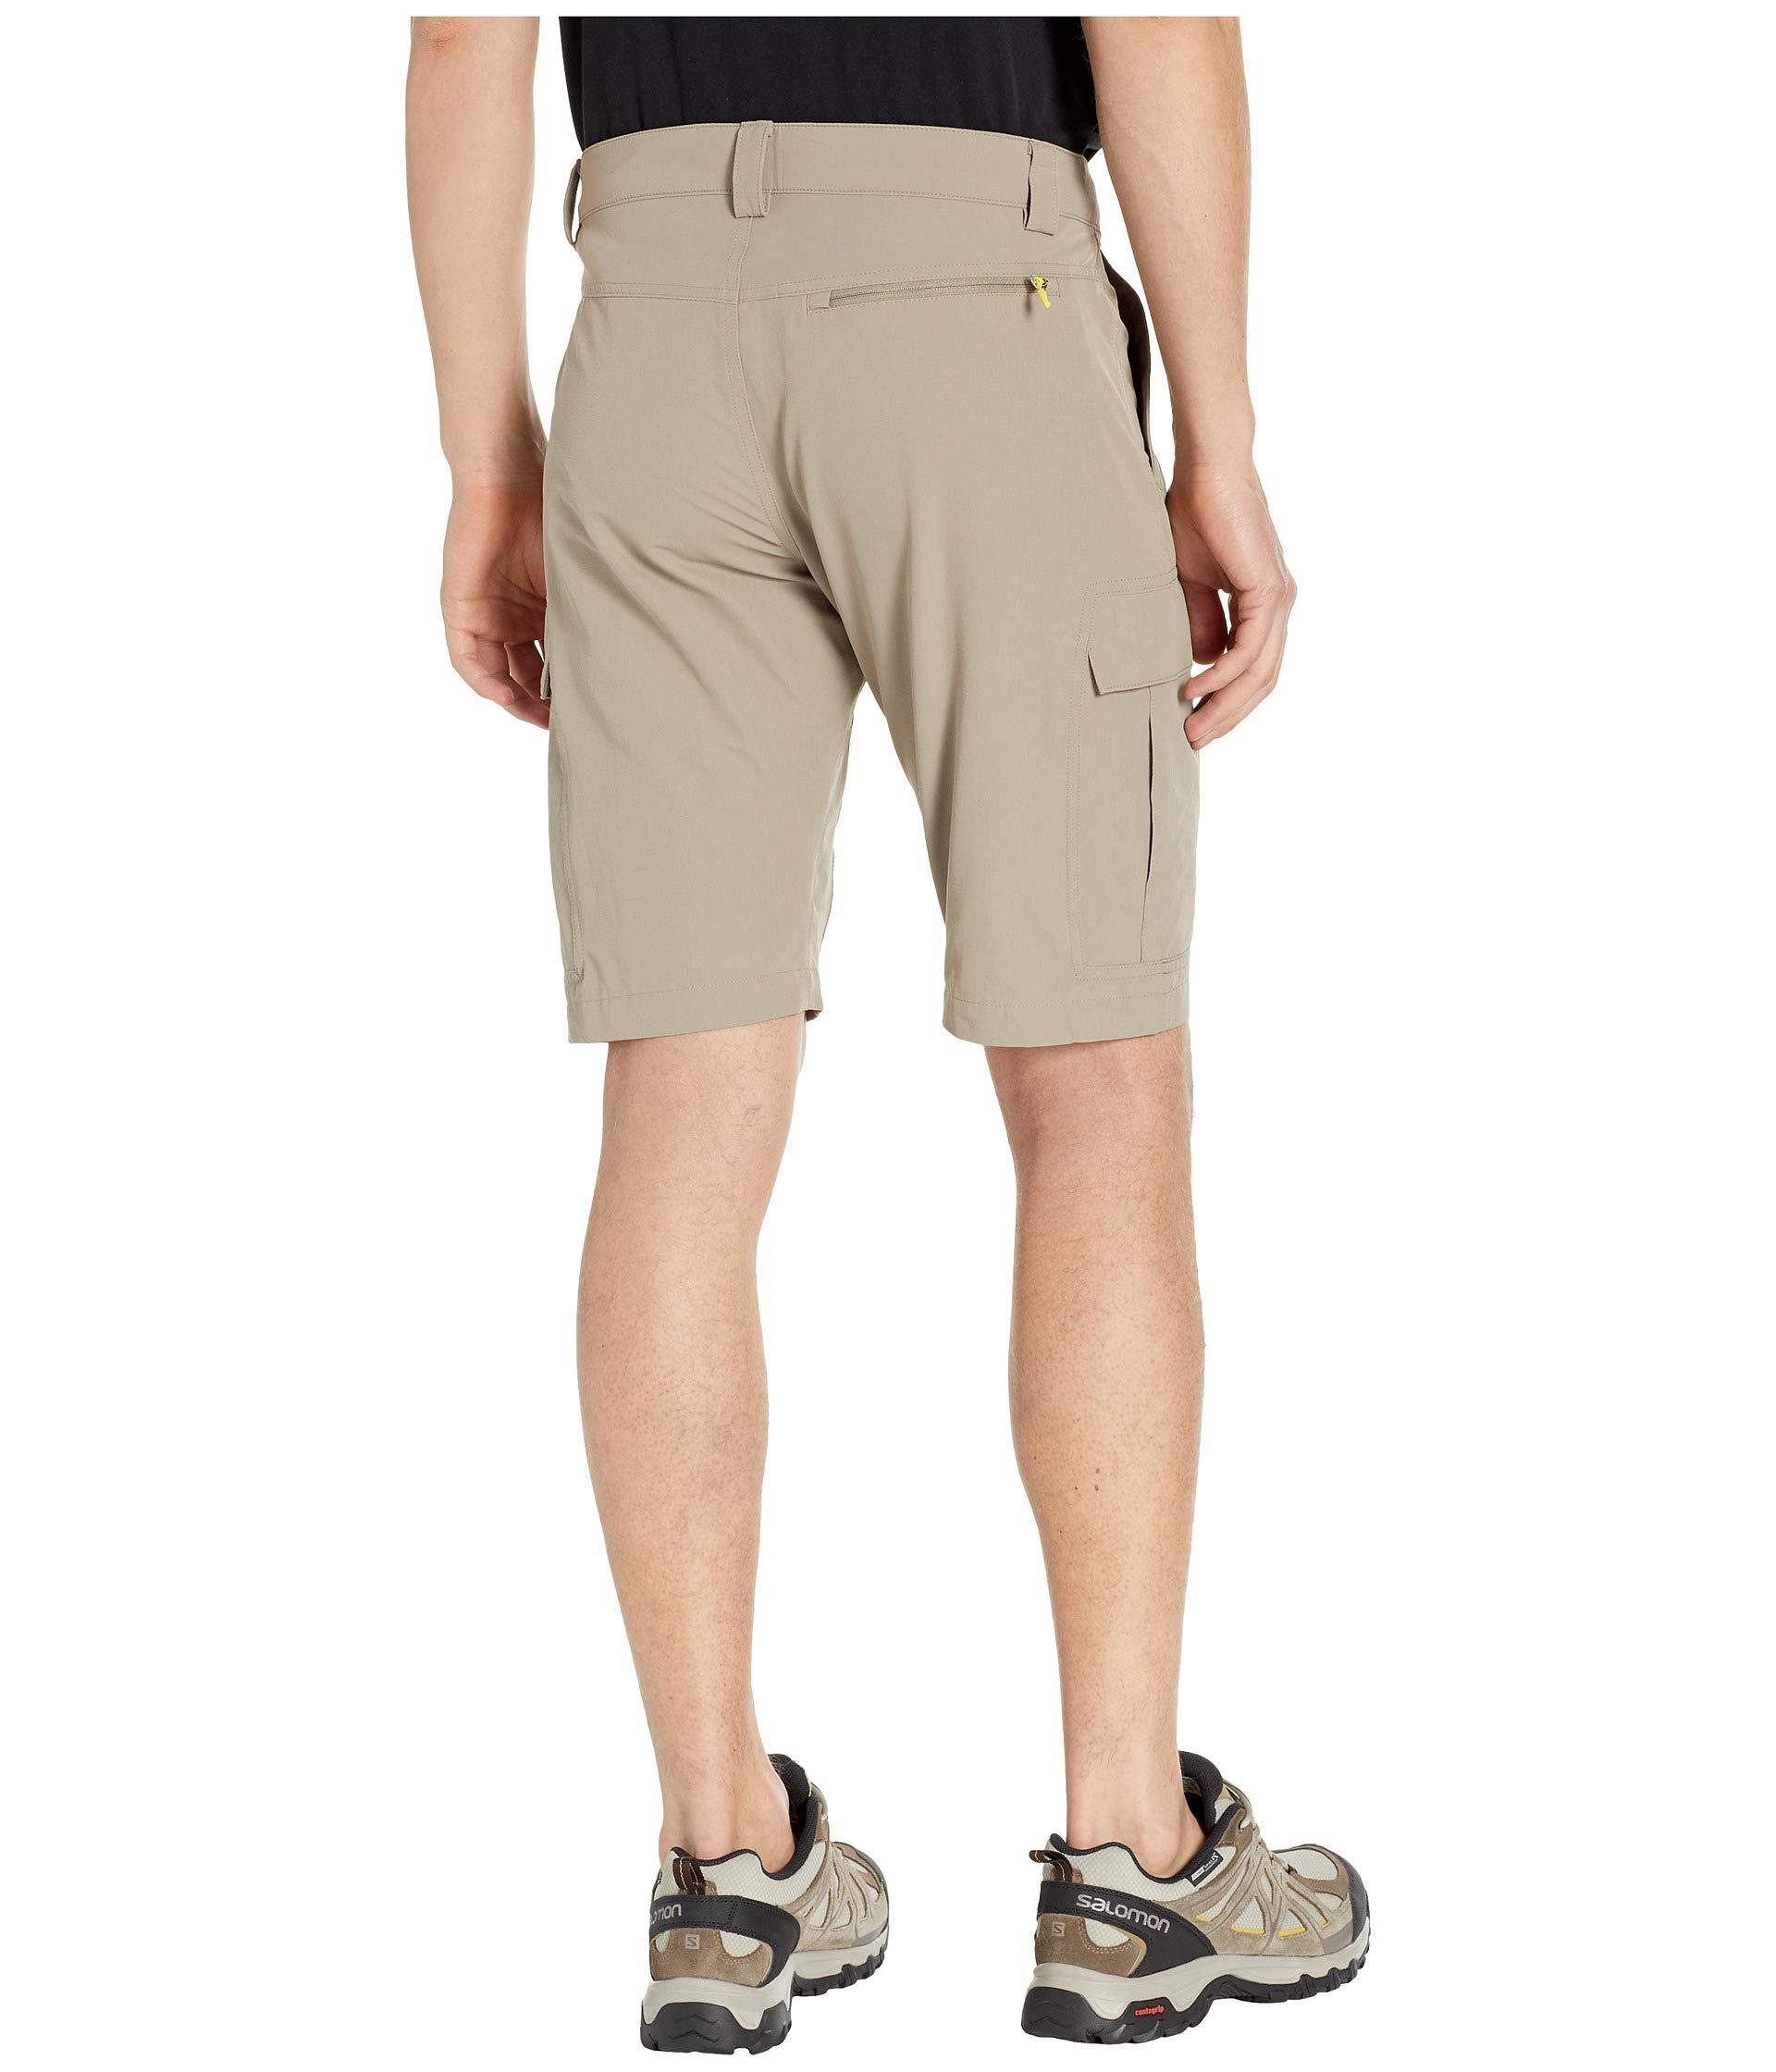 1247c8a626 Helly Hansen Jotun Qd Cargo Shorts 11 (grey Fog) Men's Shorts for ...